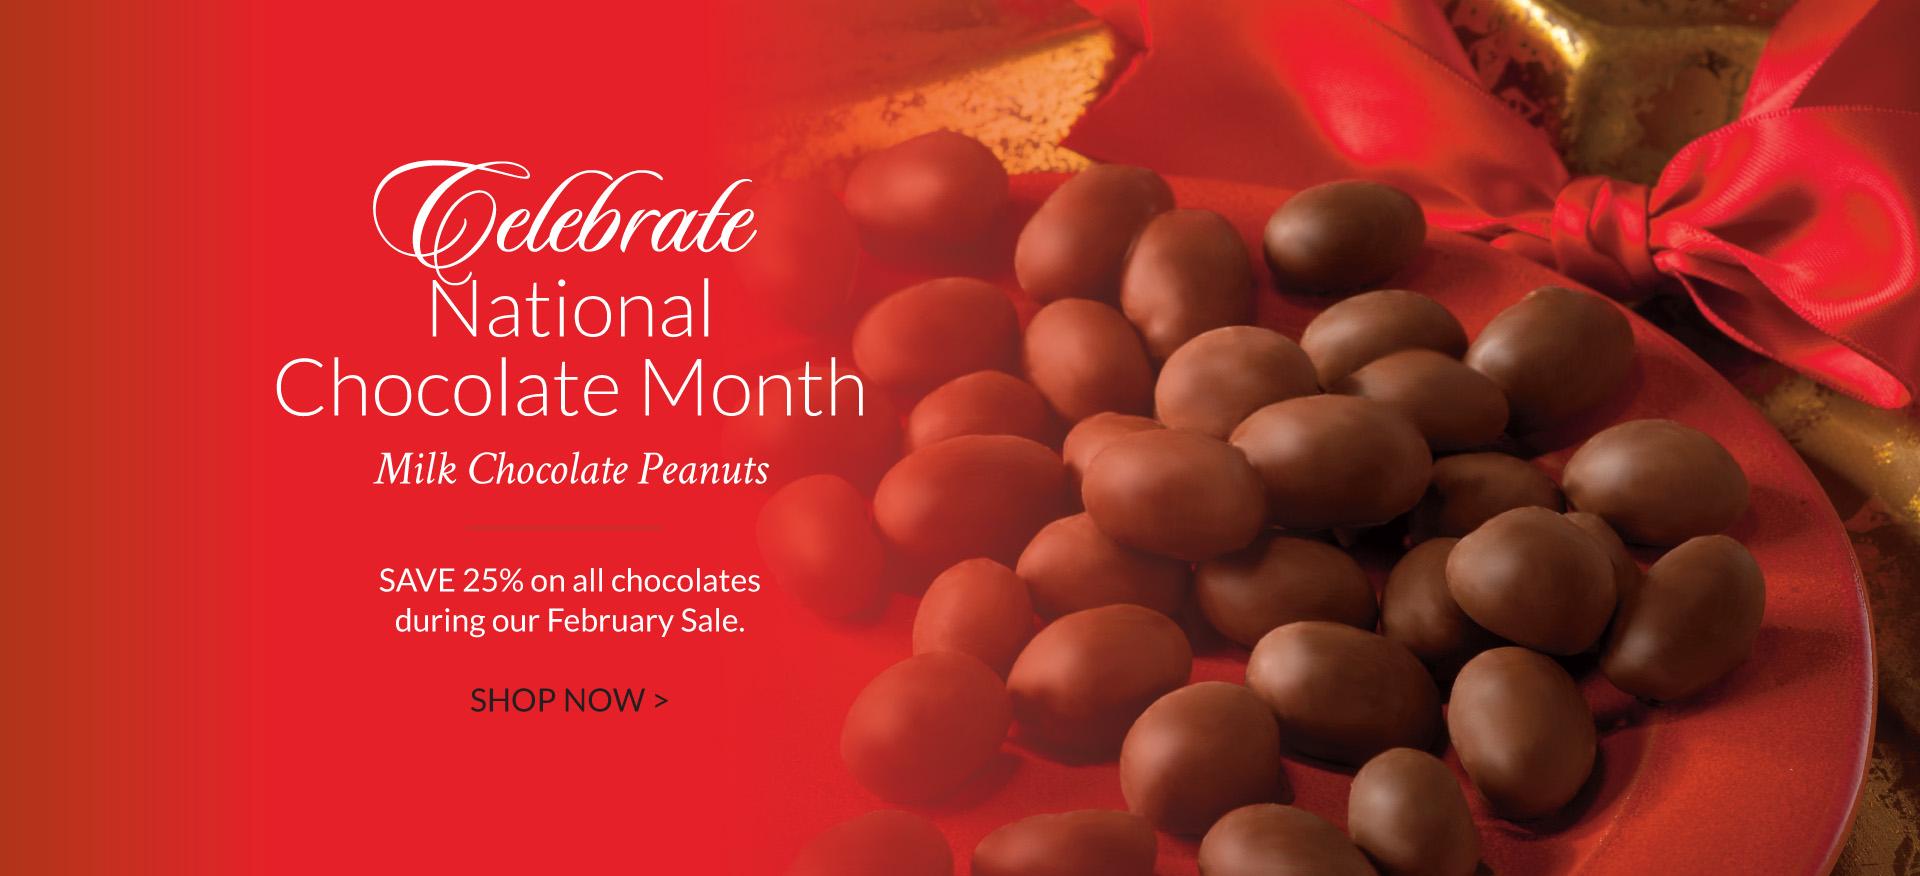 Chocolate Peanuts - The Peanut Shop of Williamsburg